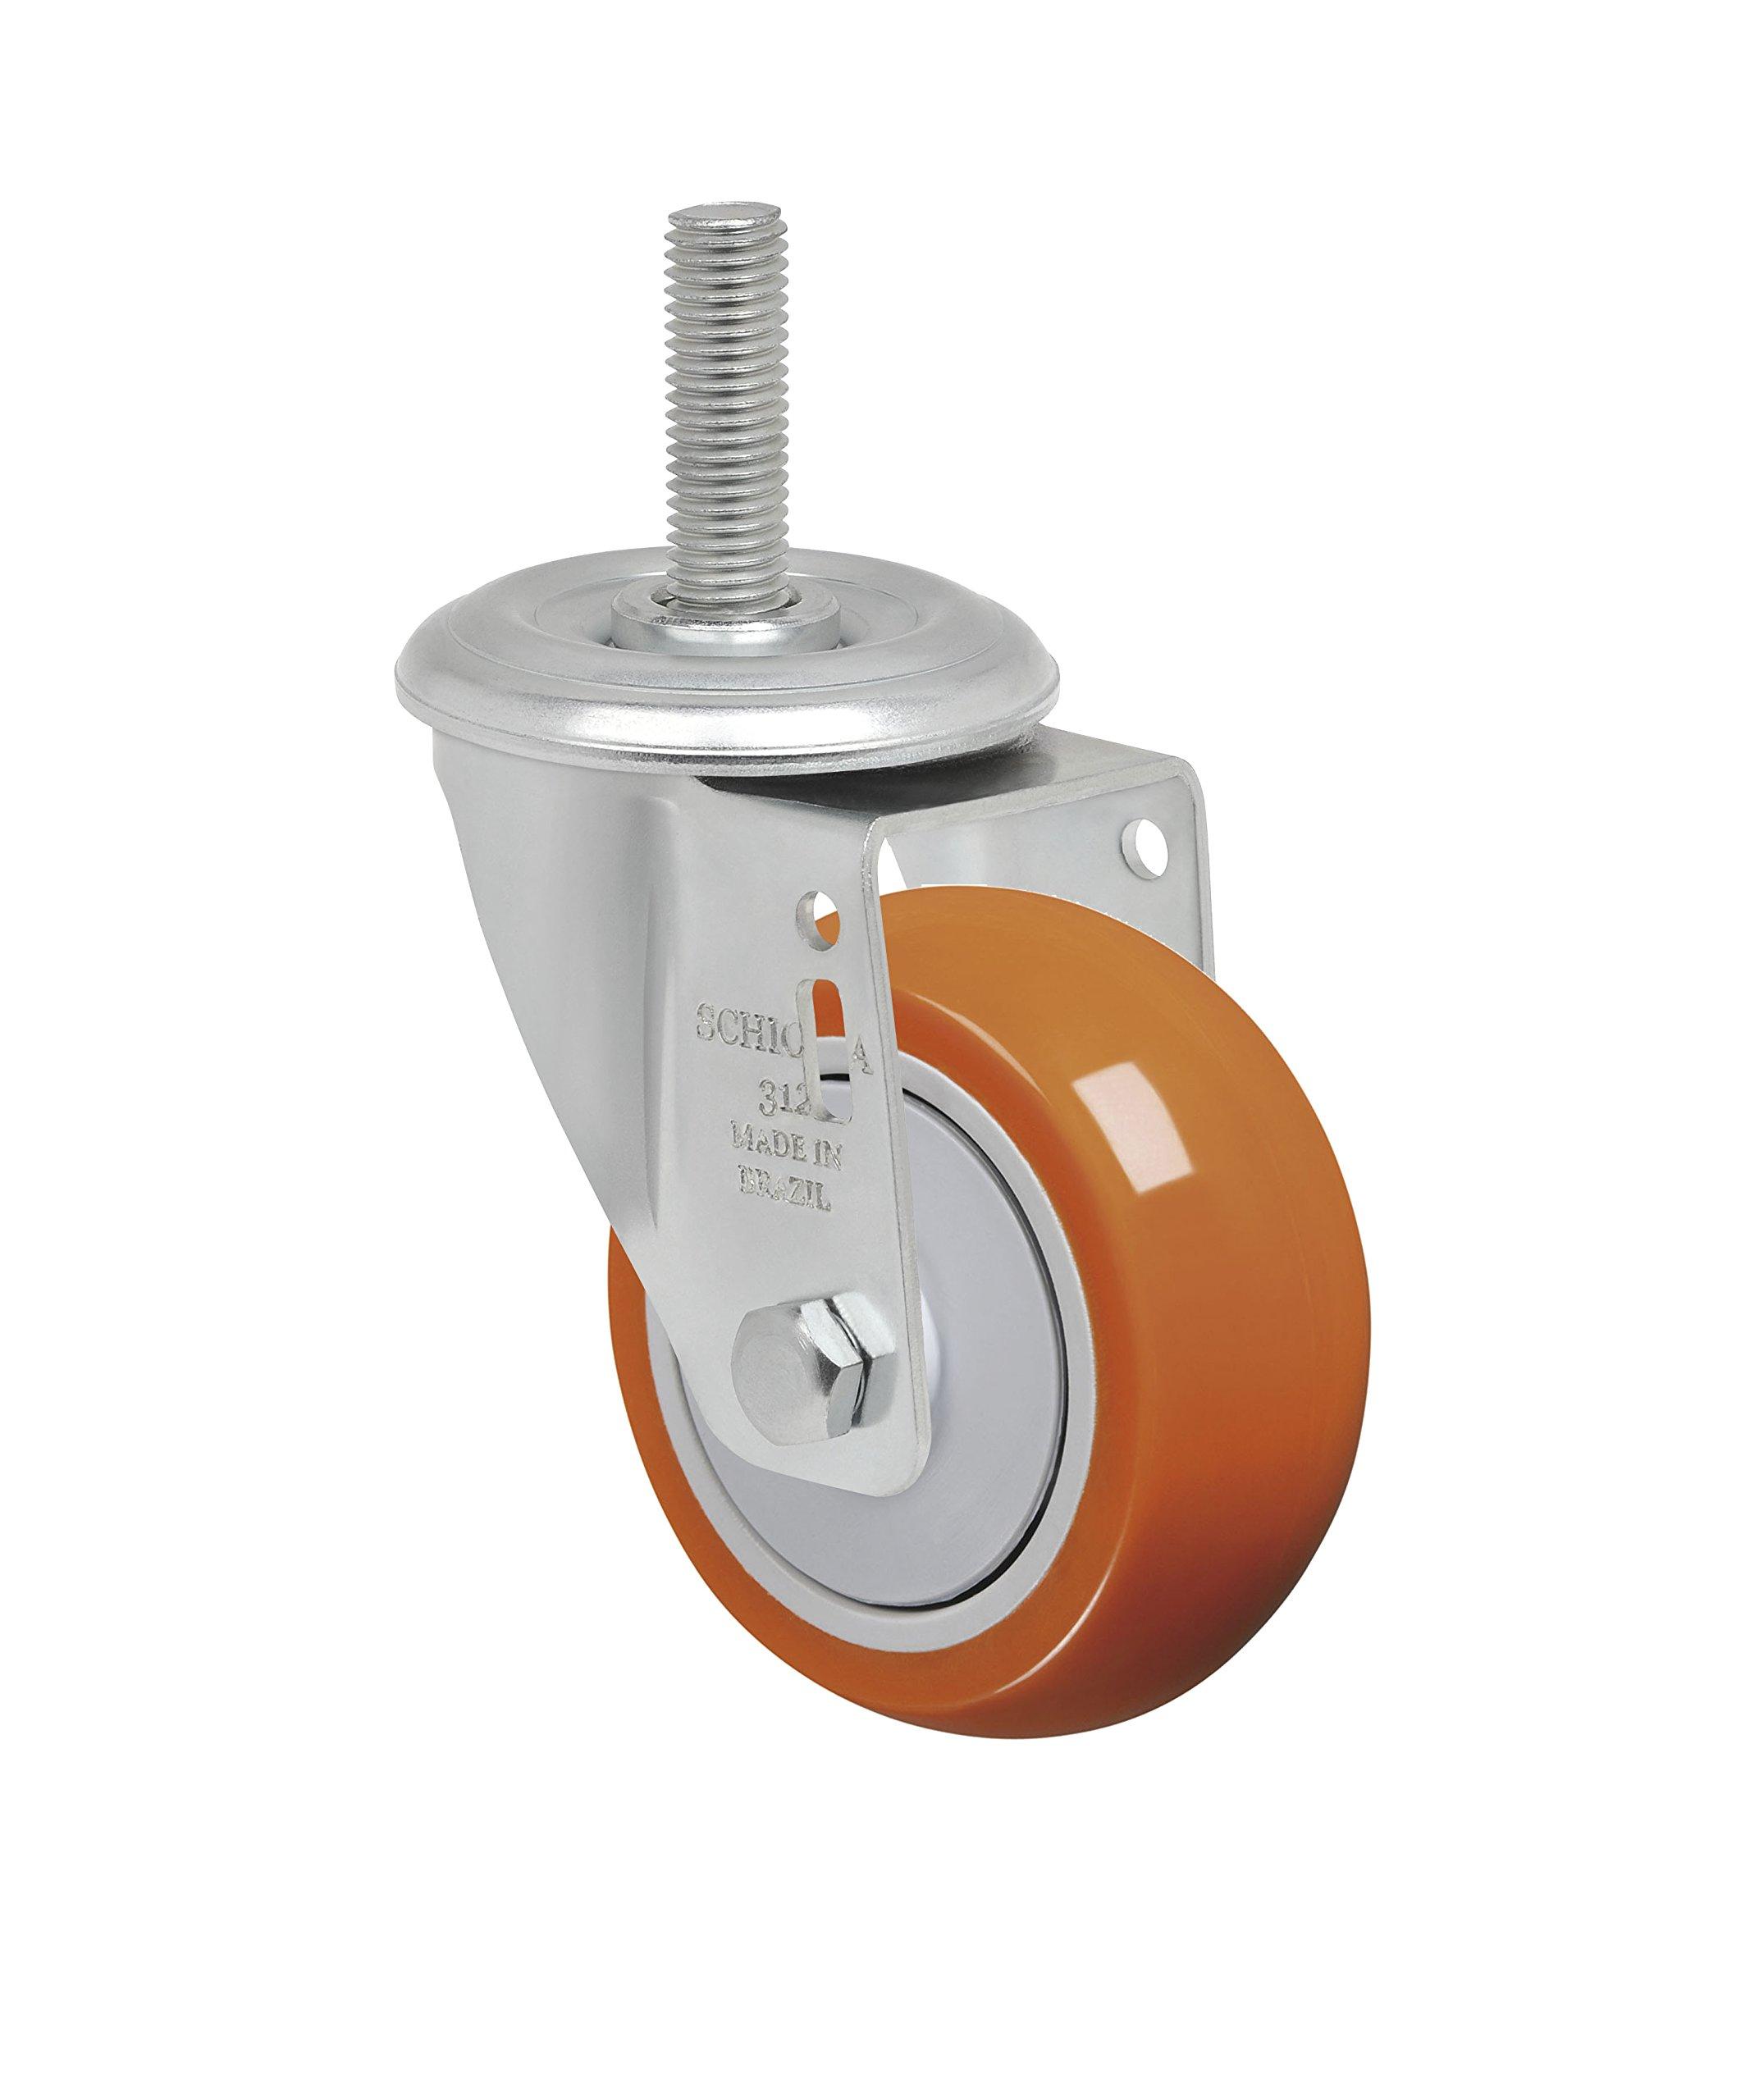 Schioppa L12 Series, GLEIH 312 UPE, 3 x 1-1/4'' Swivel Caster, Non-Marking Polyurethane Precision Ball Bearing Wheel, 175 lbs, 1/2'' Diameter x 2'' Length Threaded Stem